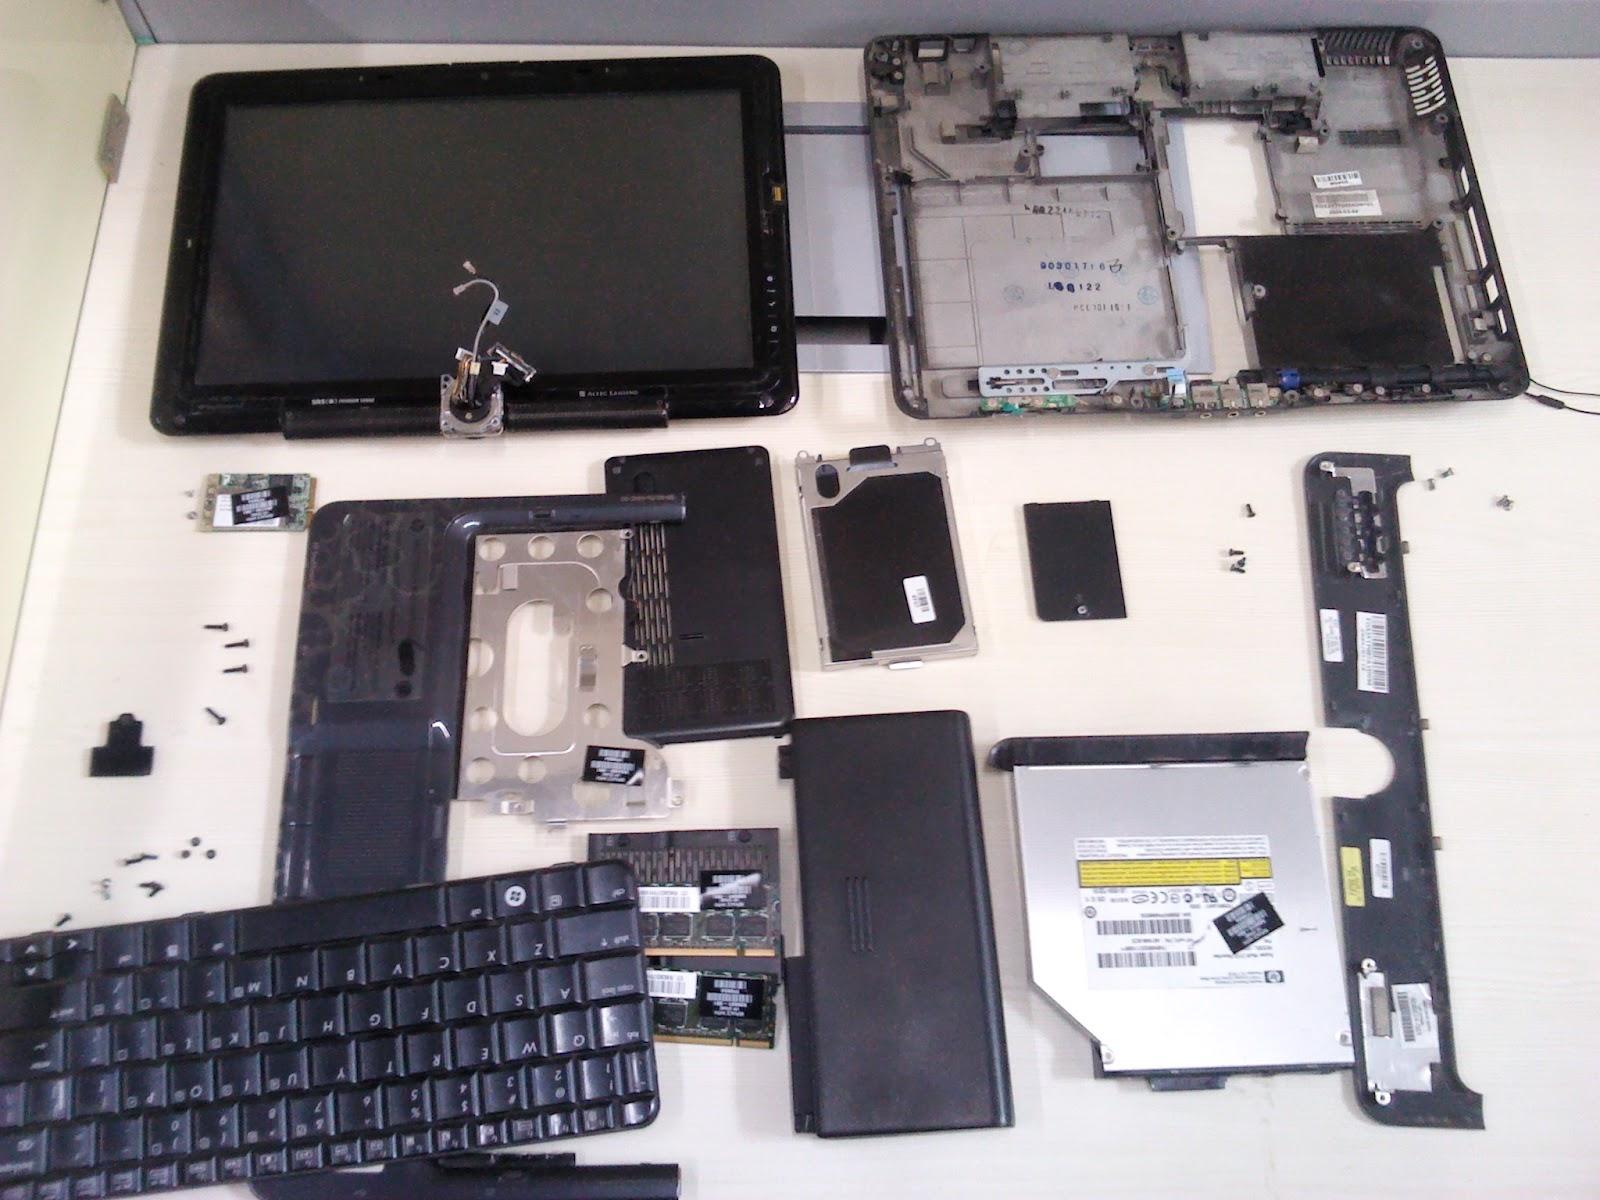 HP laptop GPU overheating problem leading to blank display